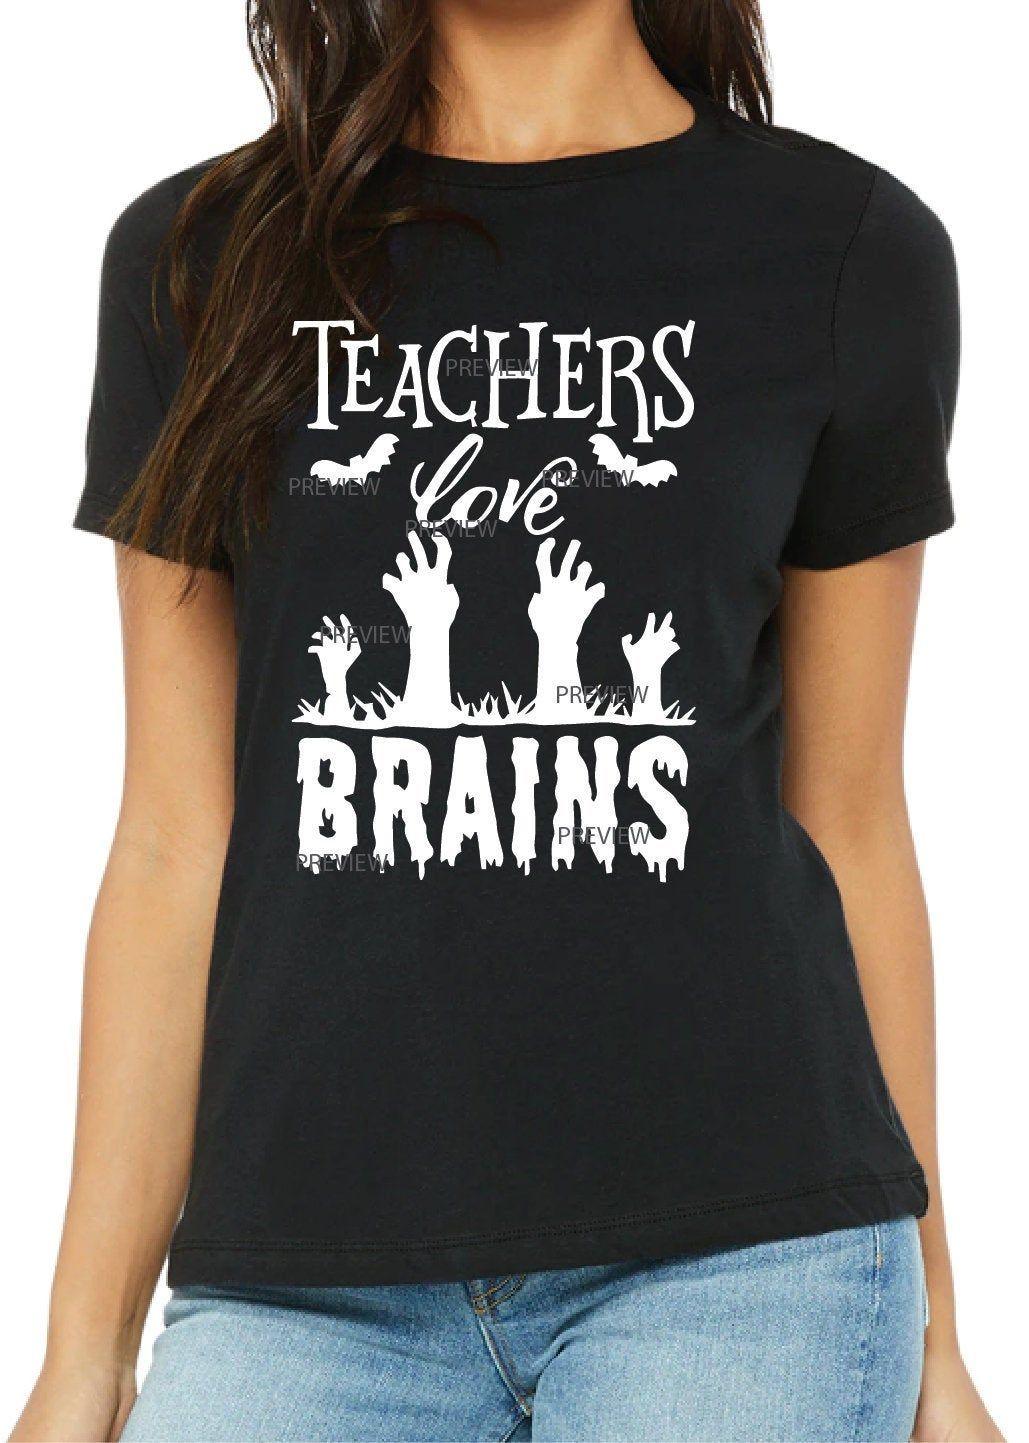 Download Teachers Love Brains SVG File | Fun christmas shirts, Kc ...